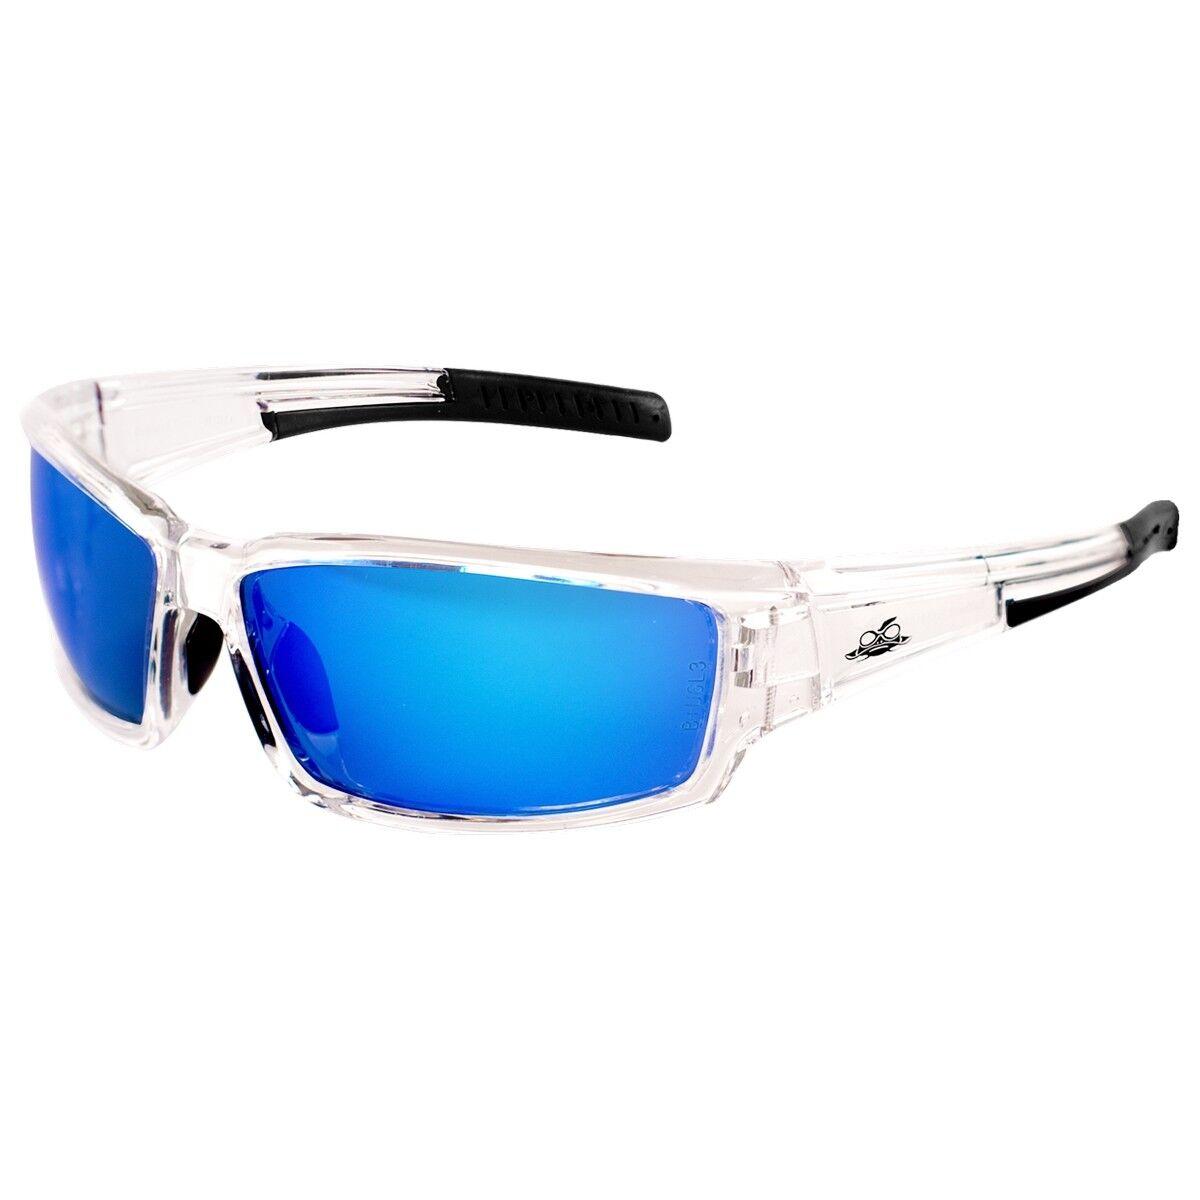 Bullhead Maki Safety Glasses with Blue Mirror Anti-Fog Lens, Clear Frame